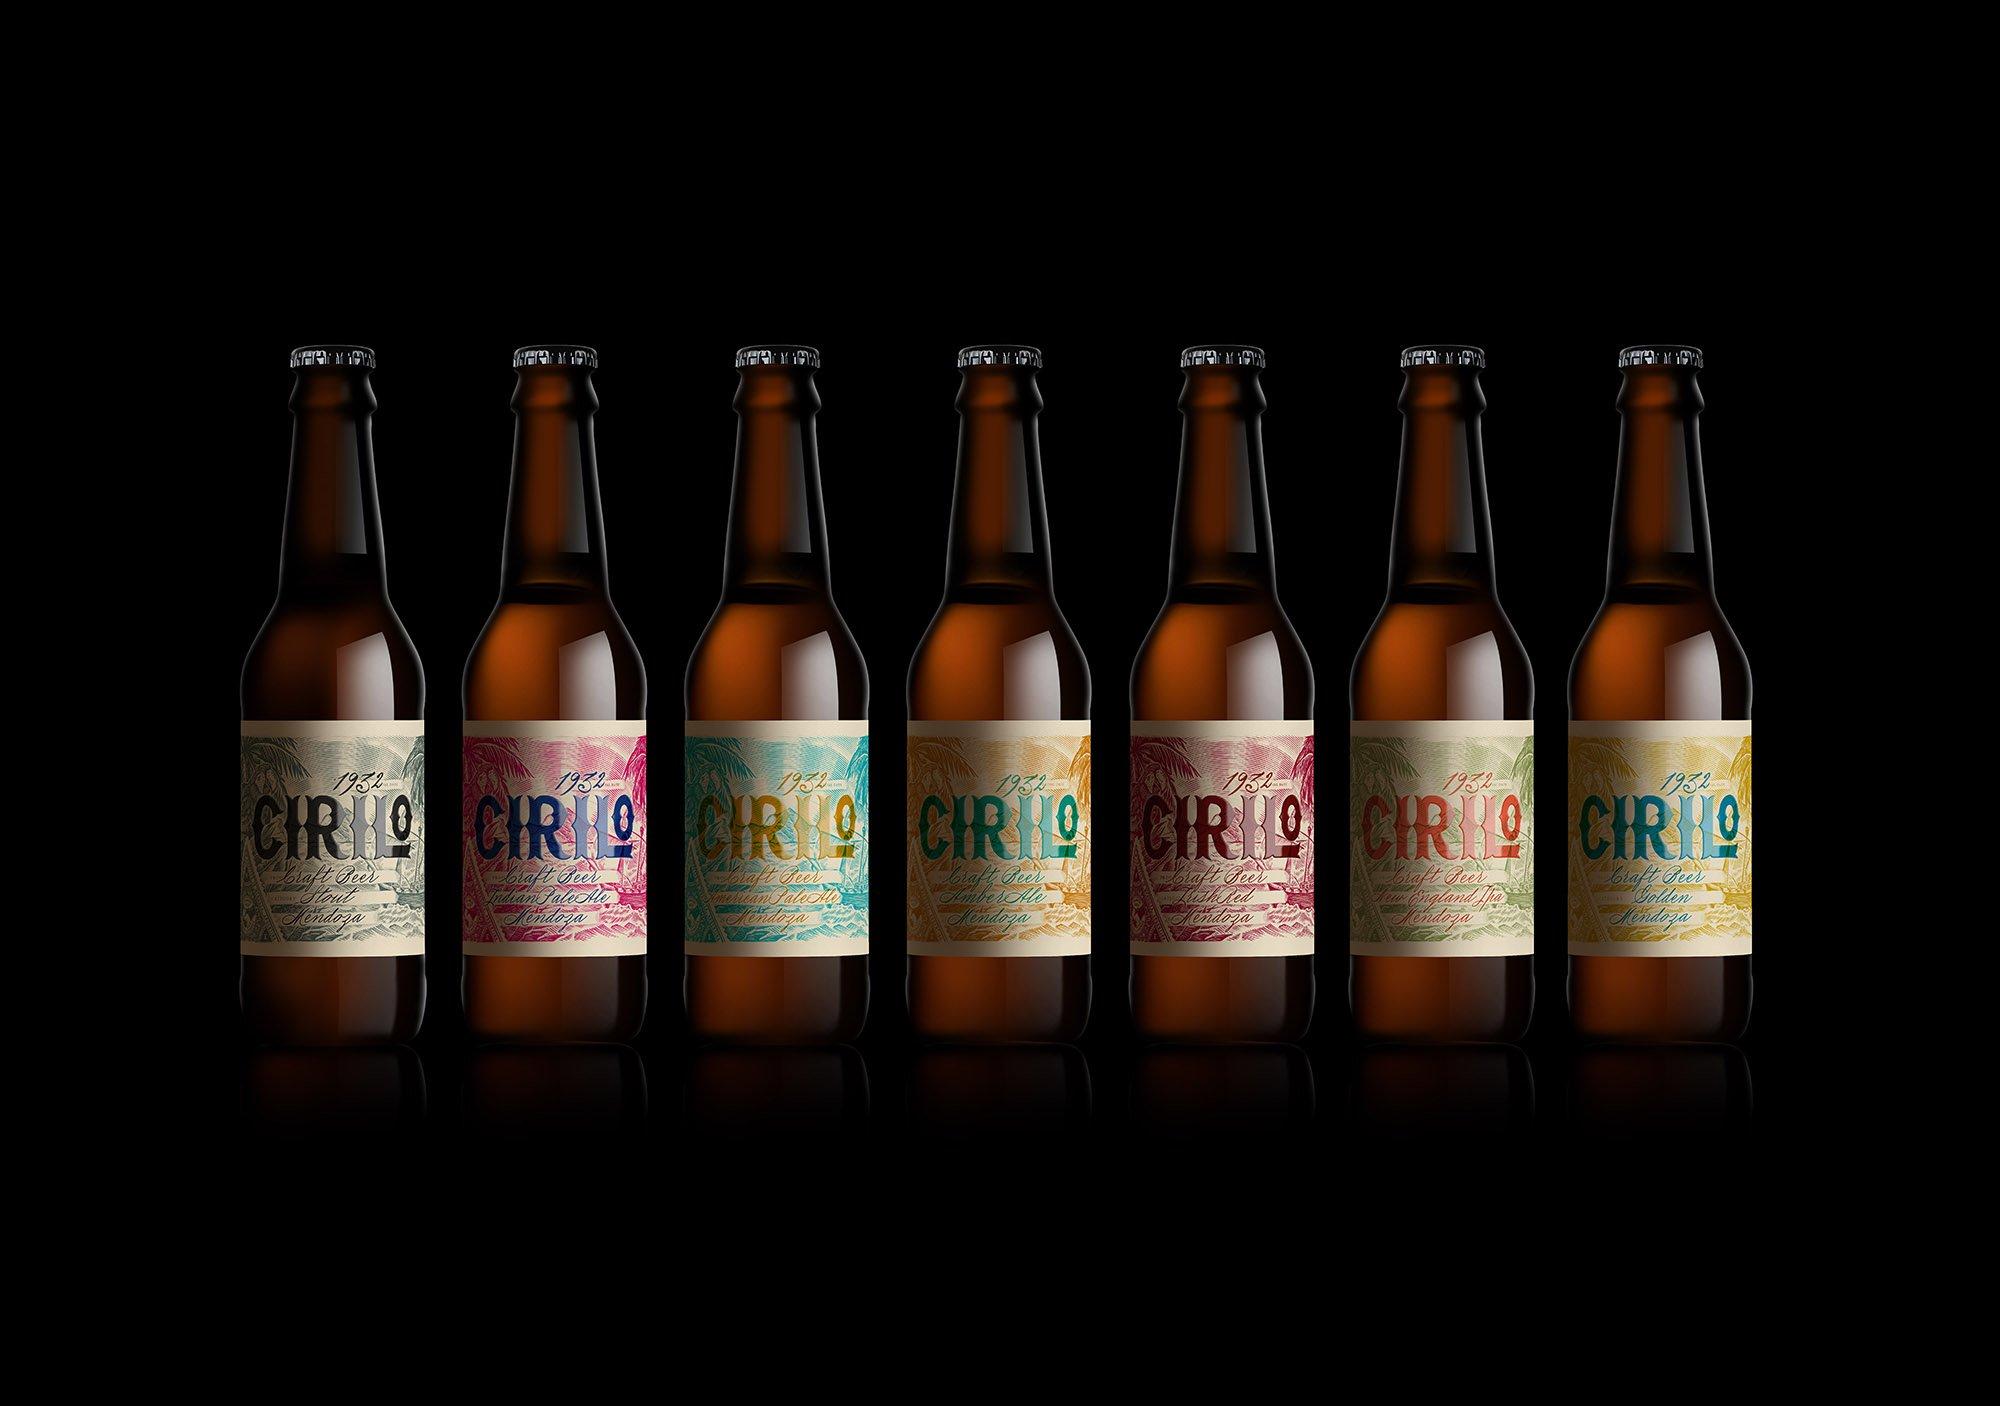 cirilo beer cerveza oveja remi